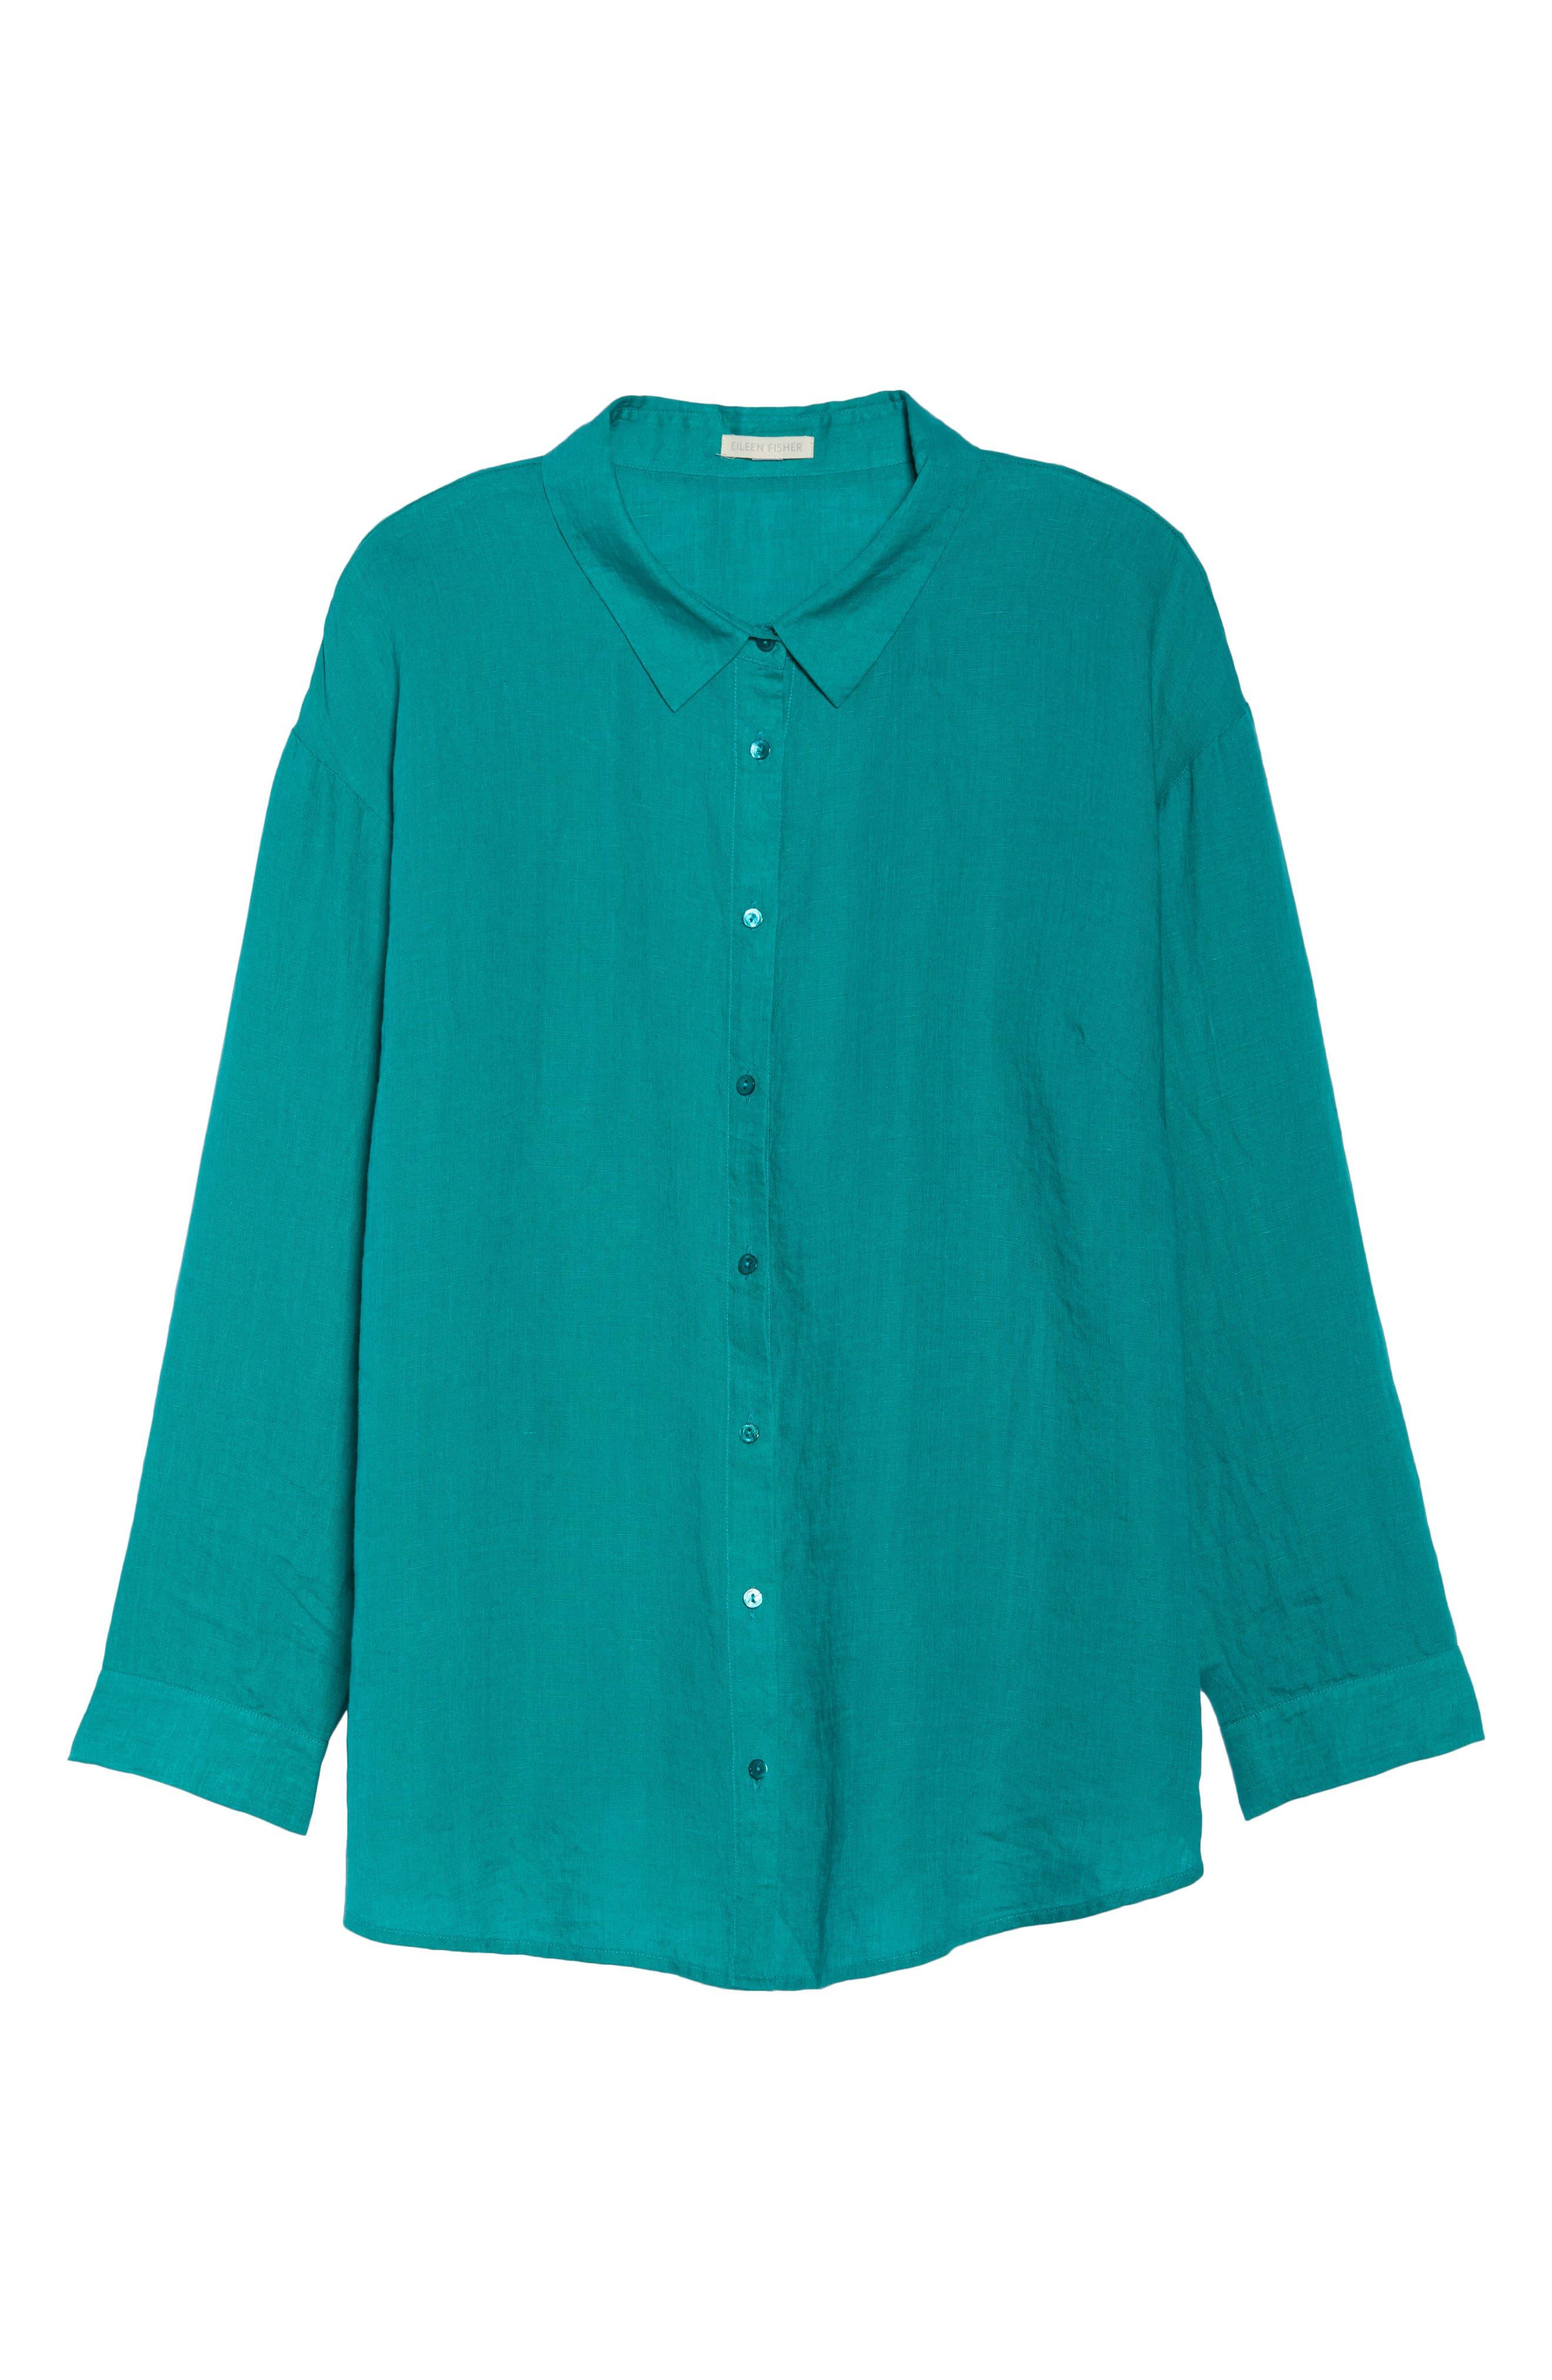 Organic Linen Shirt,                             Alternate thumbnail 7, color,                             Turquoise